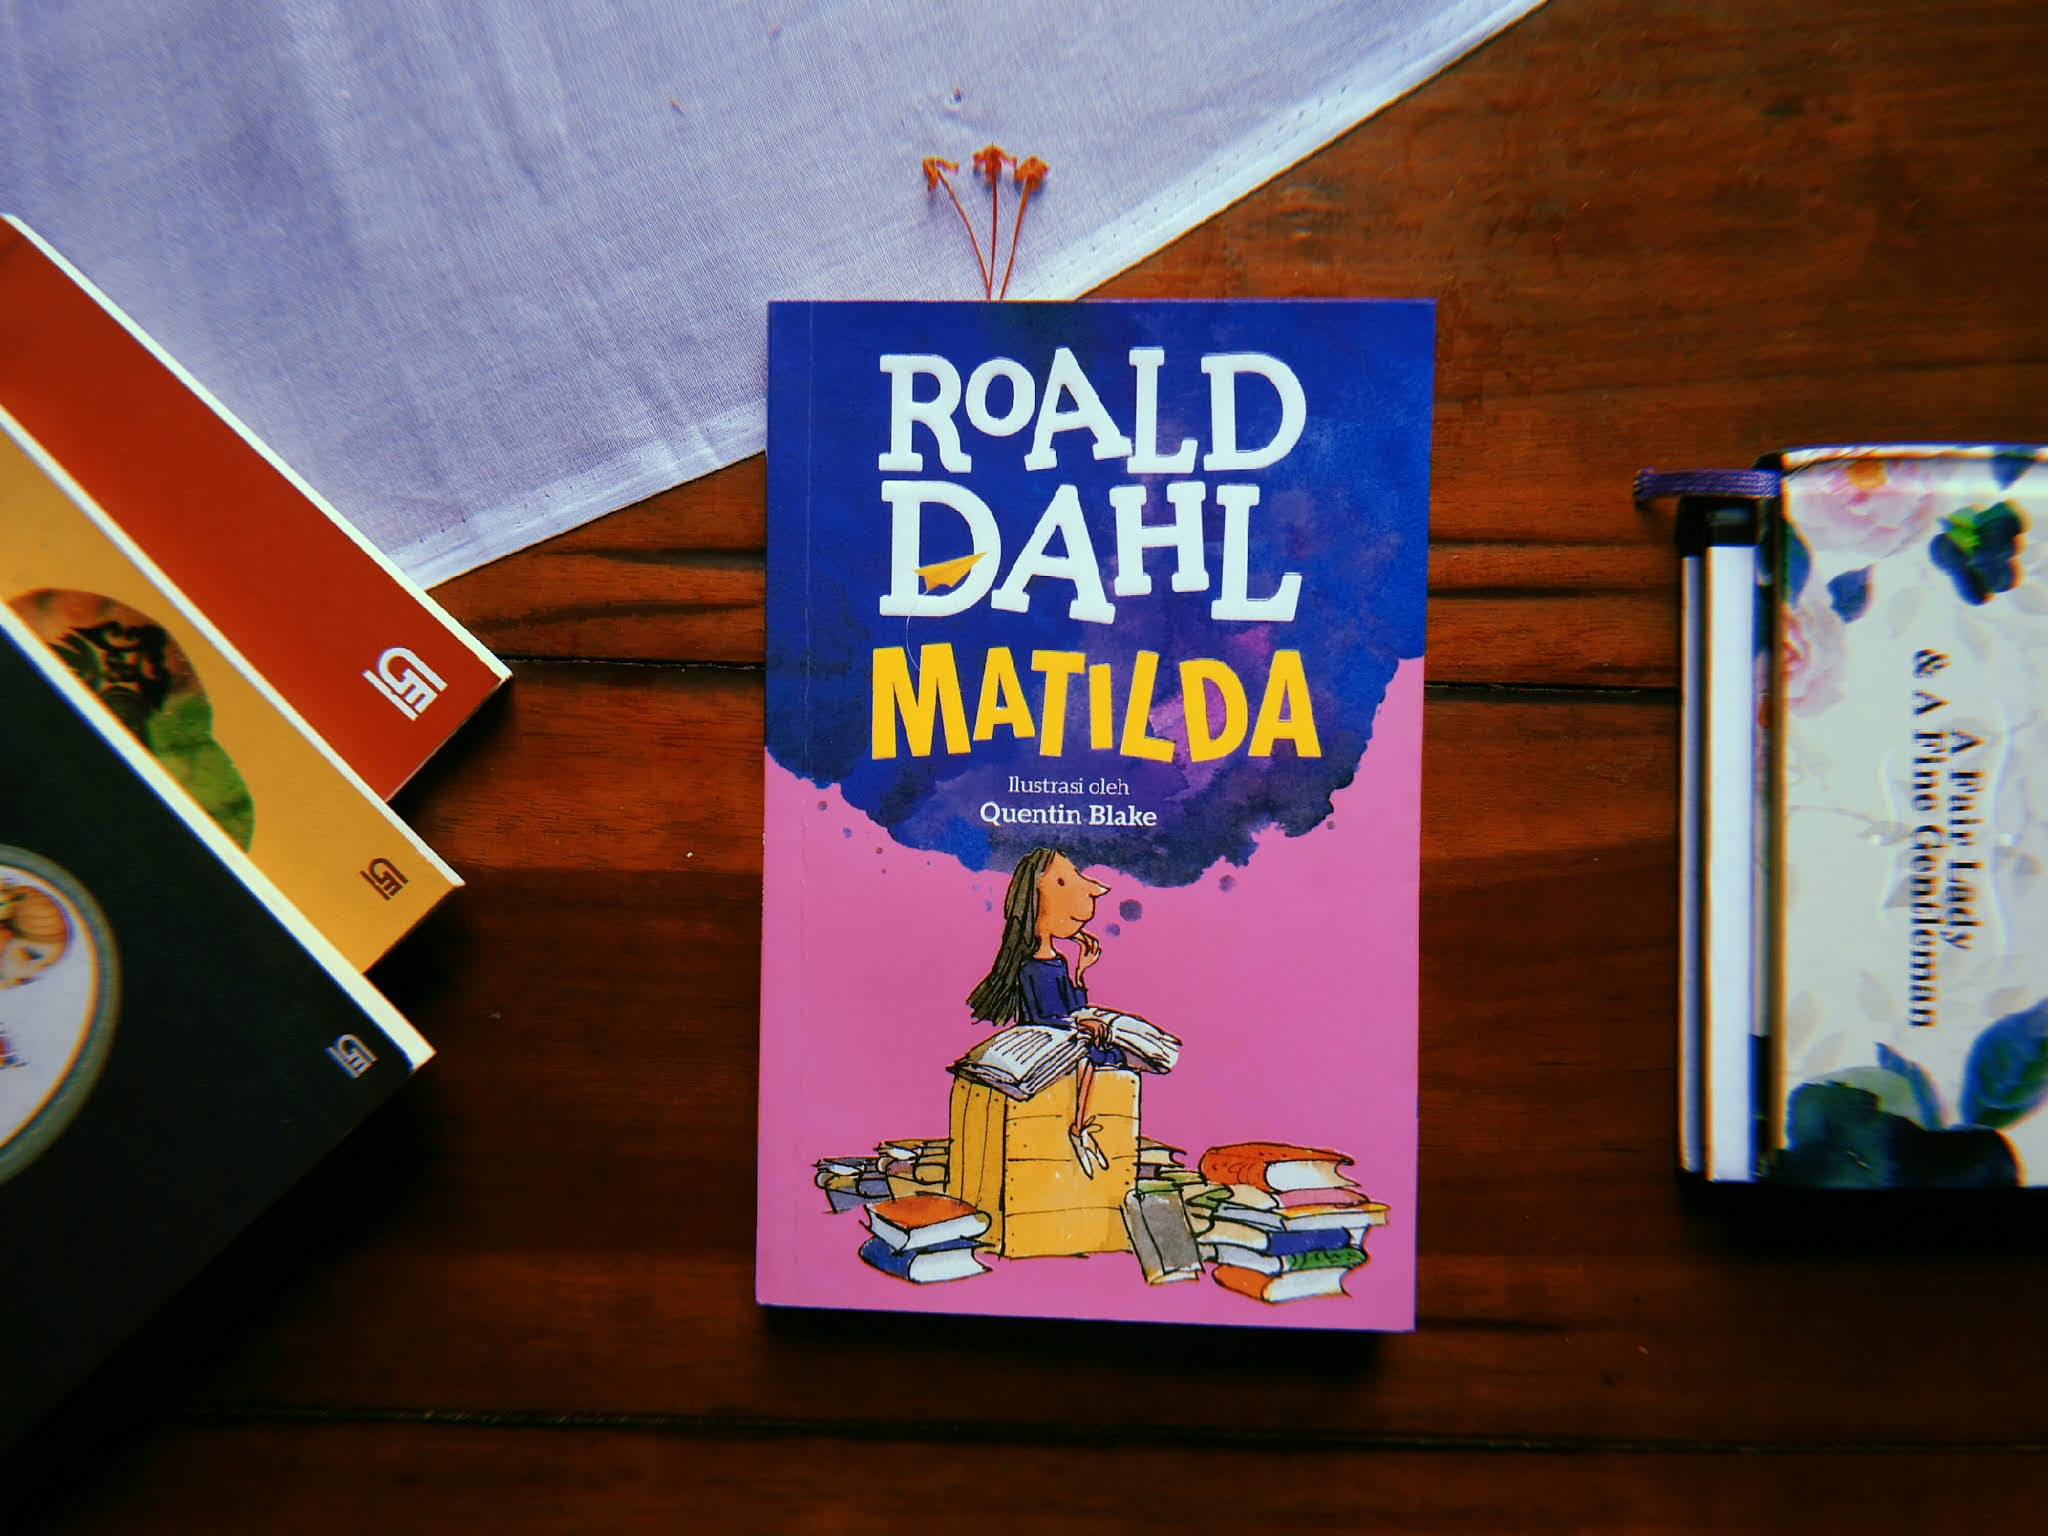 Matilda karya Roald Dahl